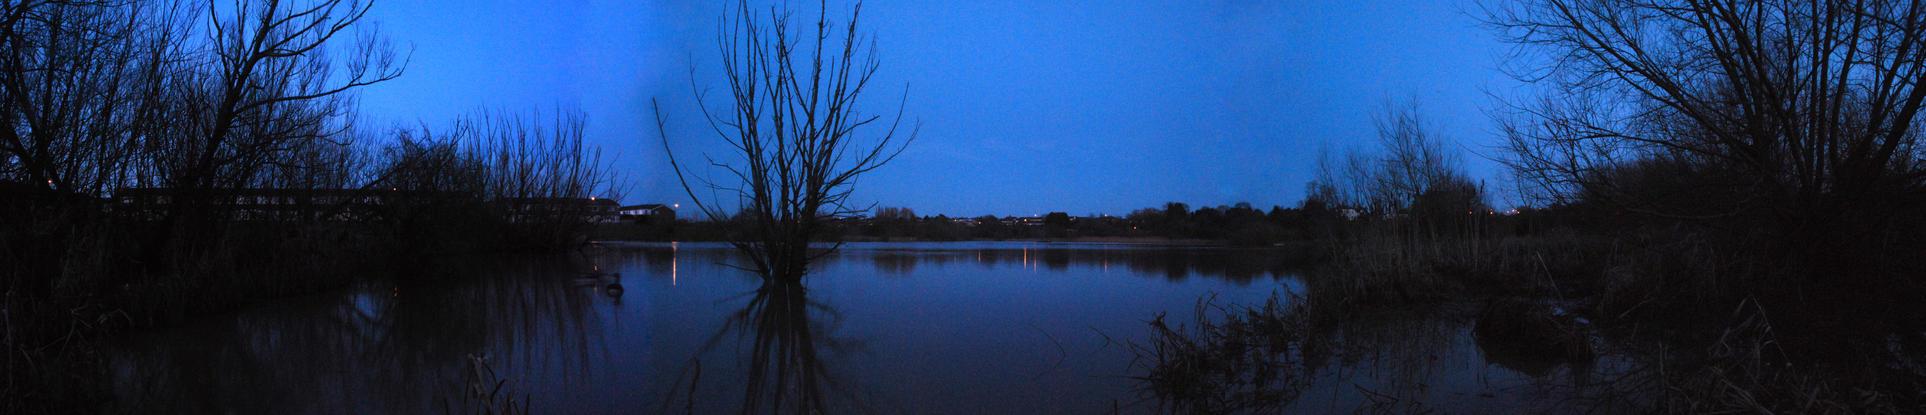 A LOVELY EVENING - Stoke Floods, West Midlands, UK by ili137